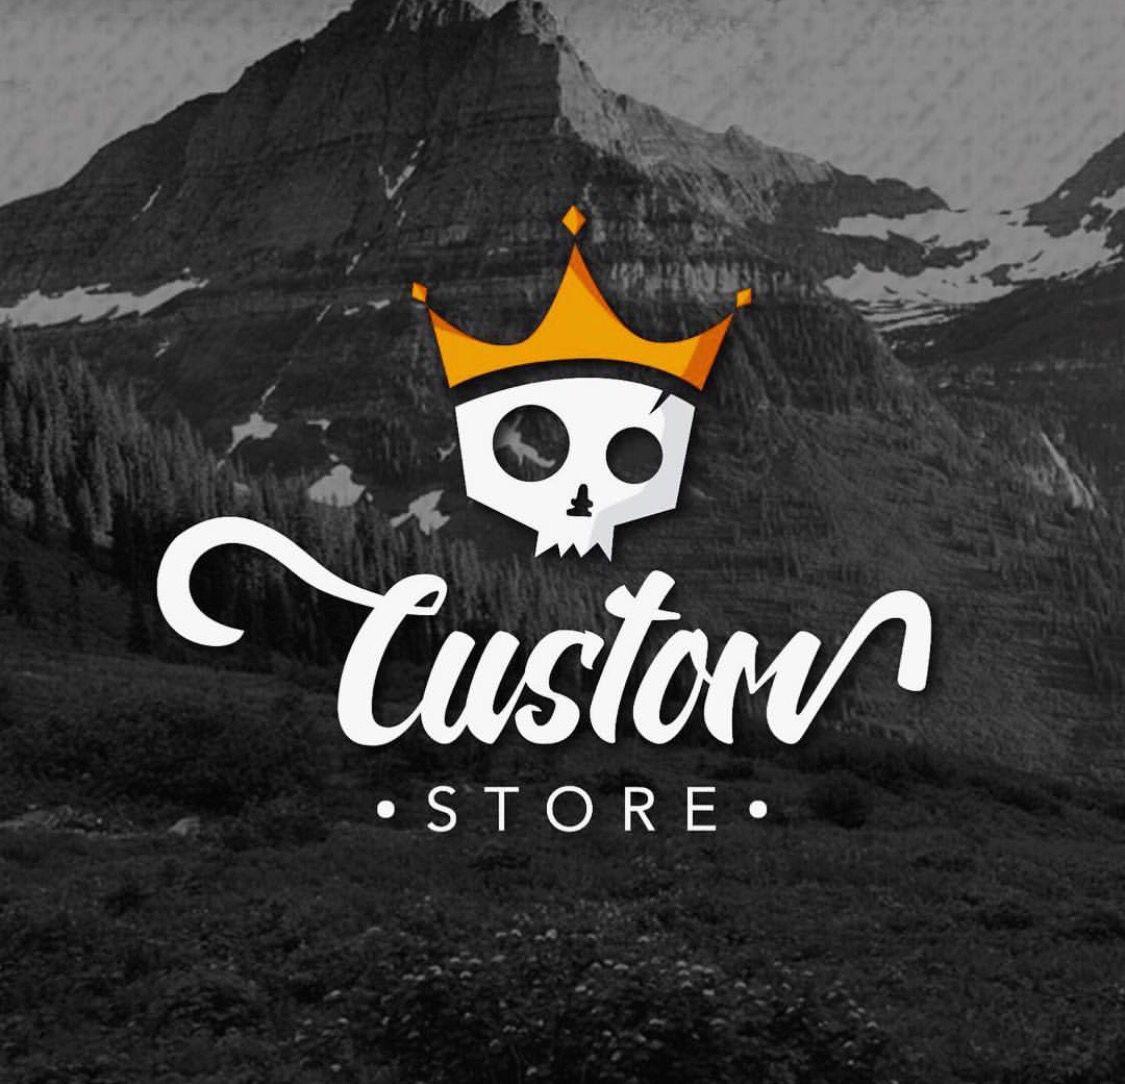 ef07ad49c Logomarca desenvolvida para loja de roupas masculinas online.  logomarca   design  brand  logo  logotype